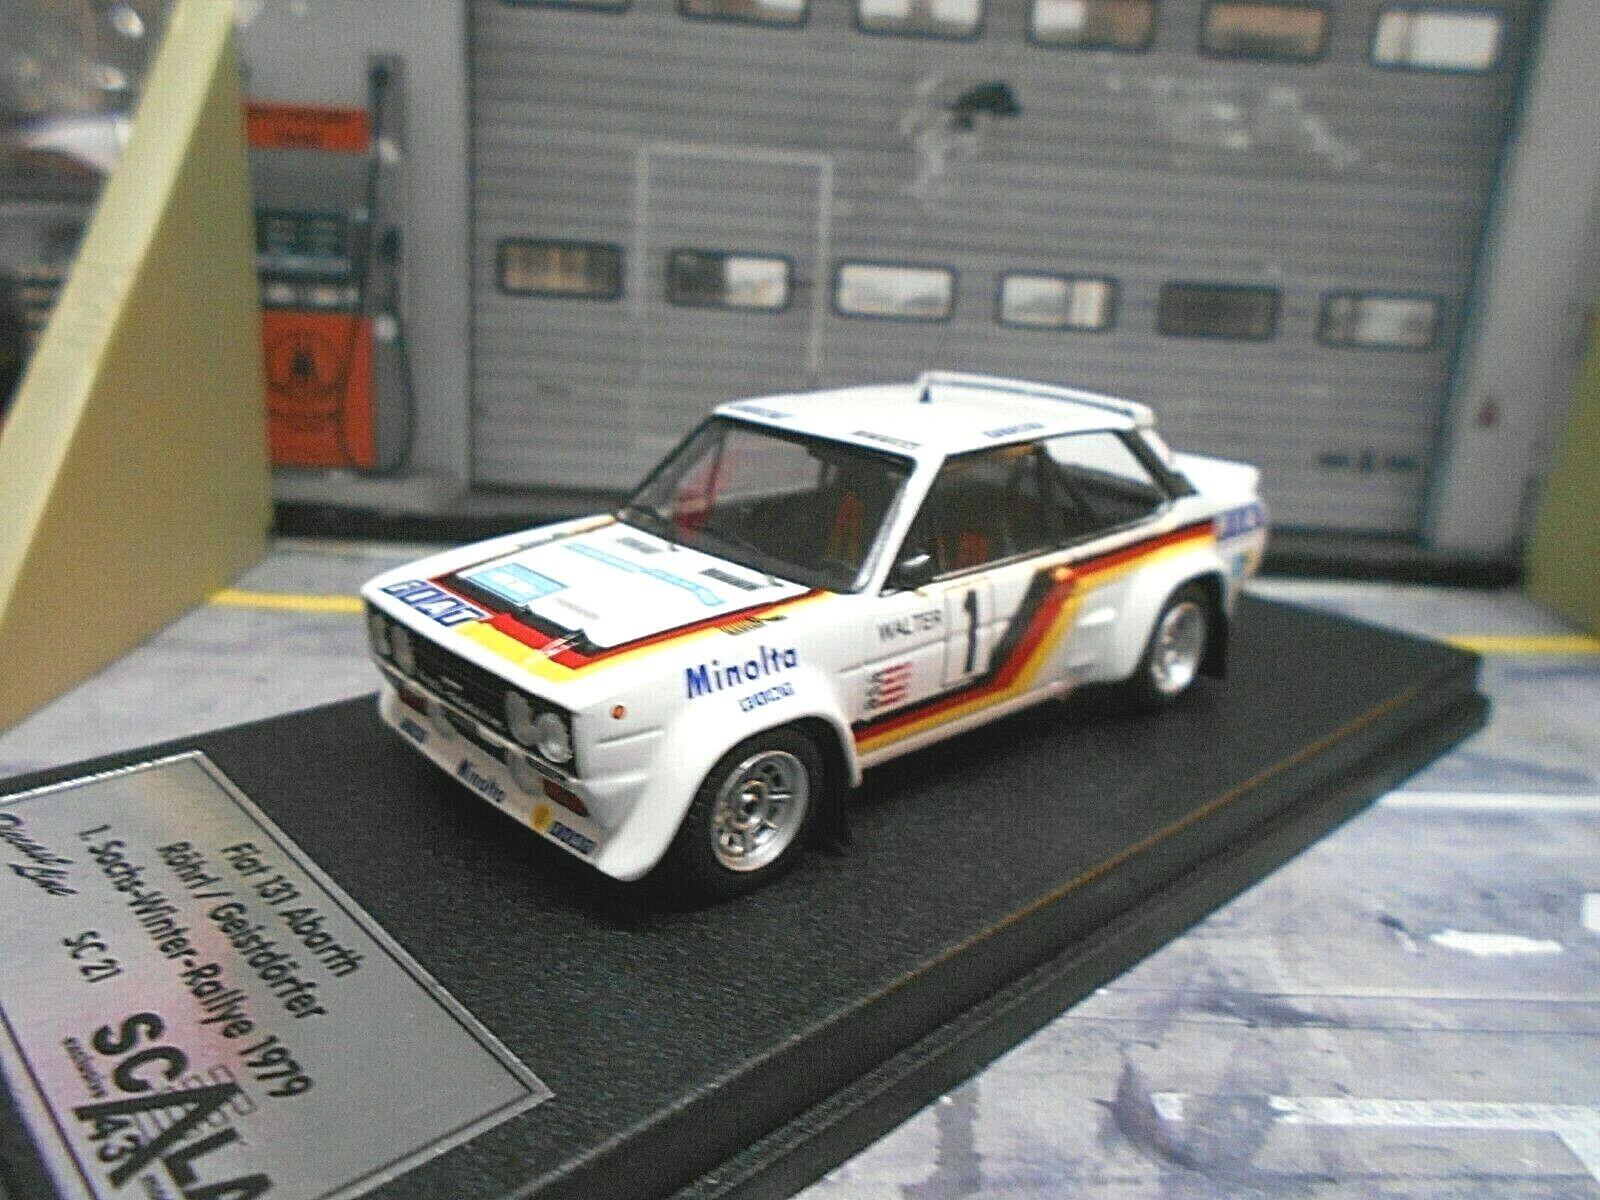 FIAT 131 Abarth Rallye  Sachs Winter DRM 1979 Sieg  1 Röhrl Minolta Trofeu 1 43  bas prix